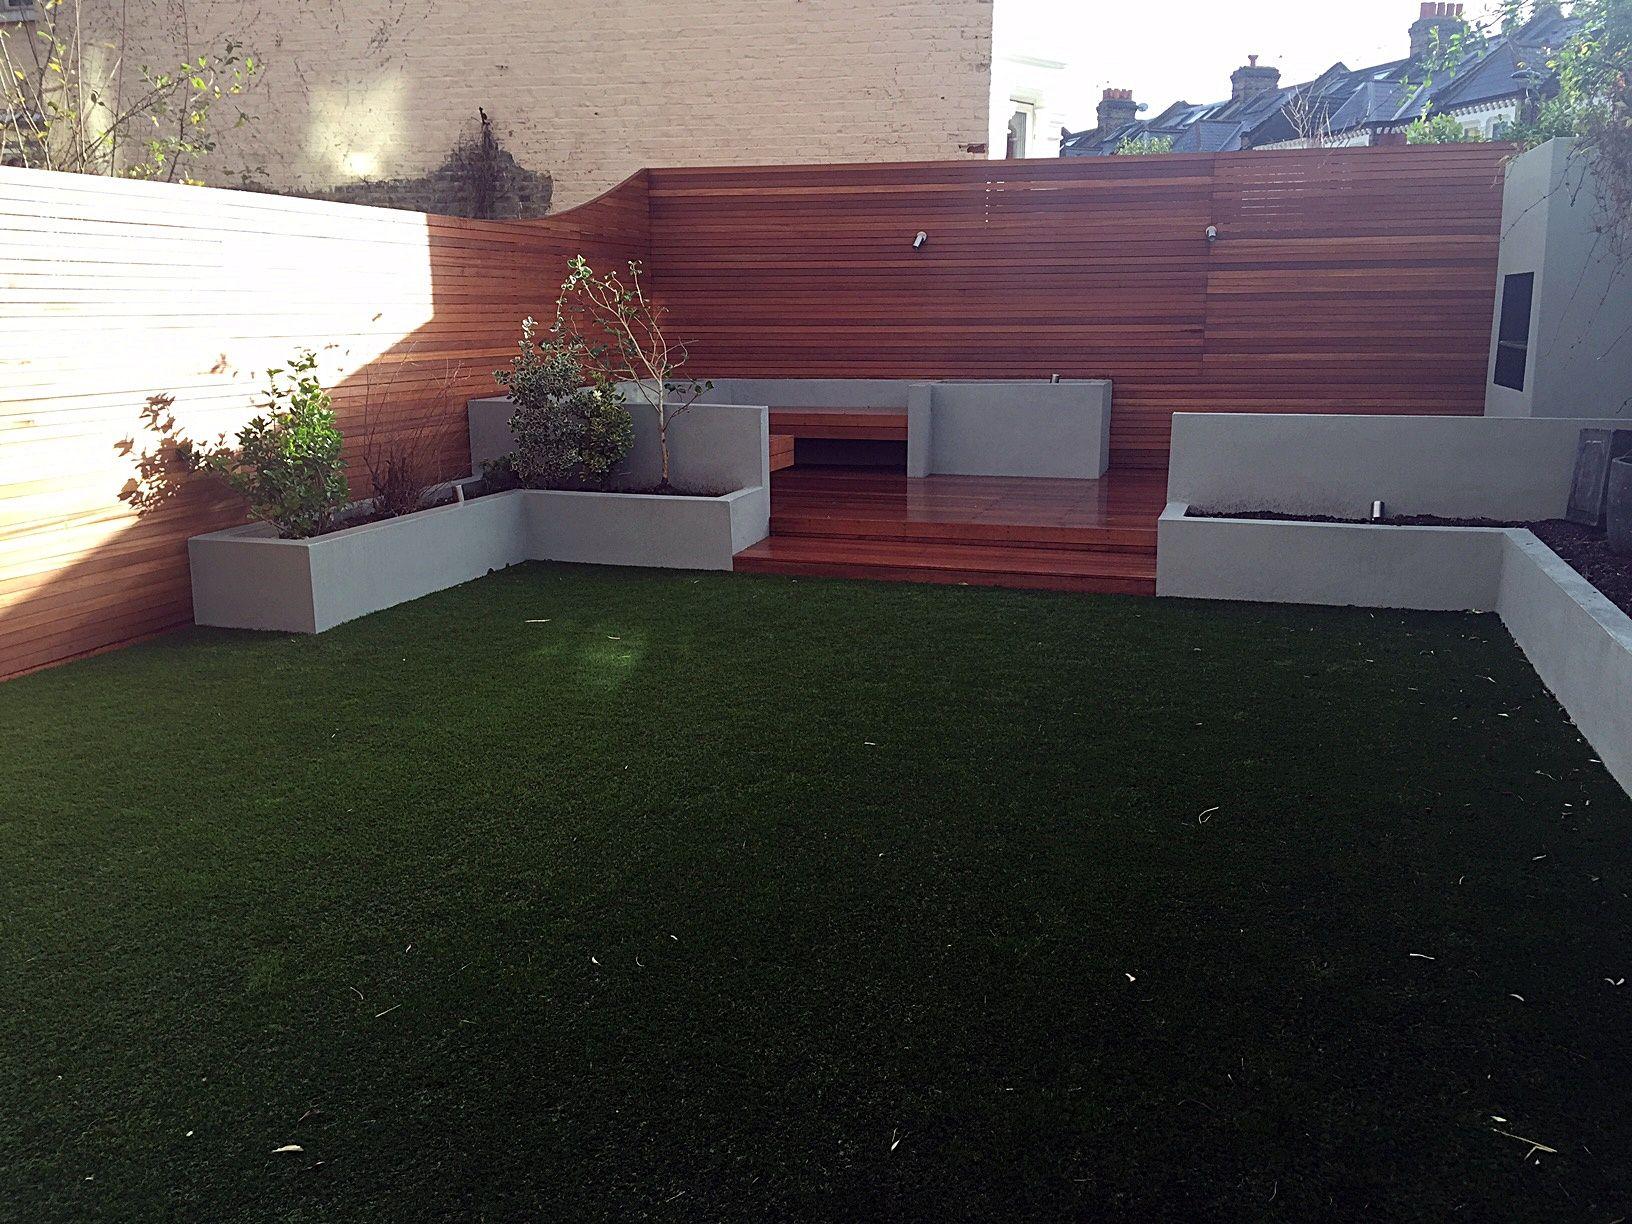 cream tiles pleached trees artificial grass garden lighting